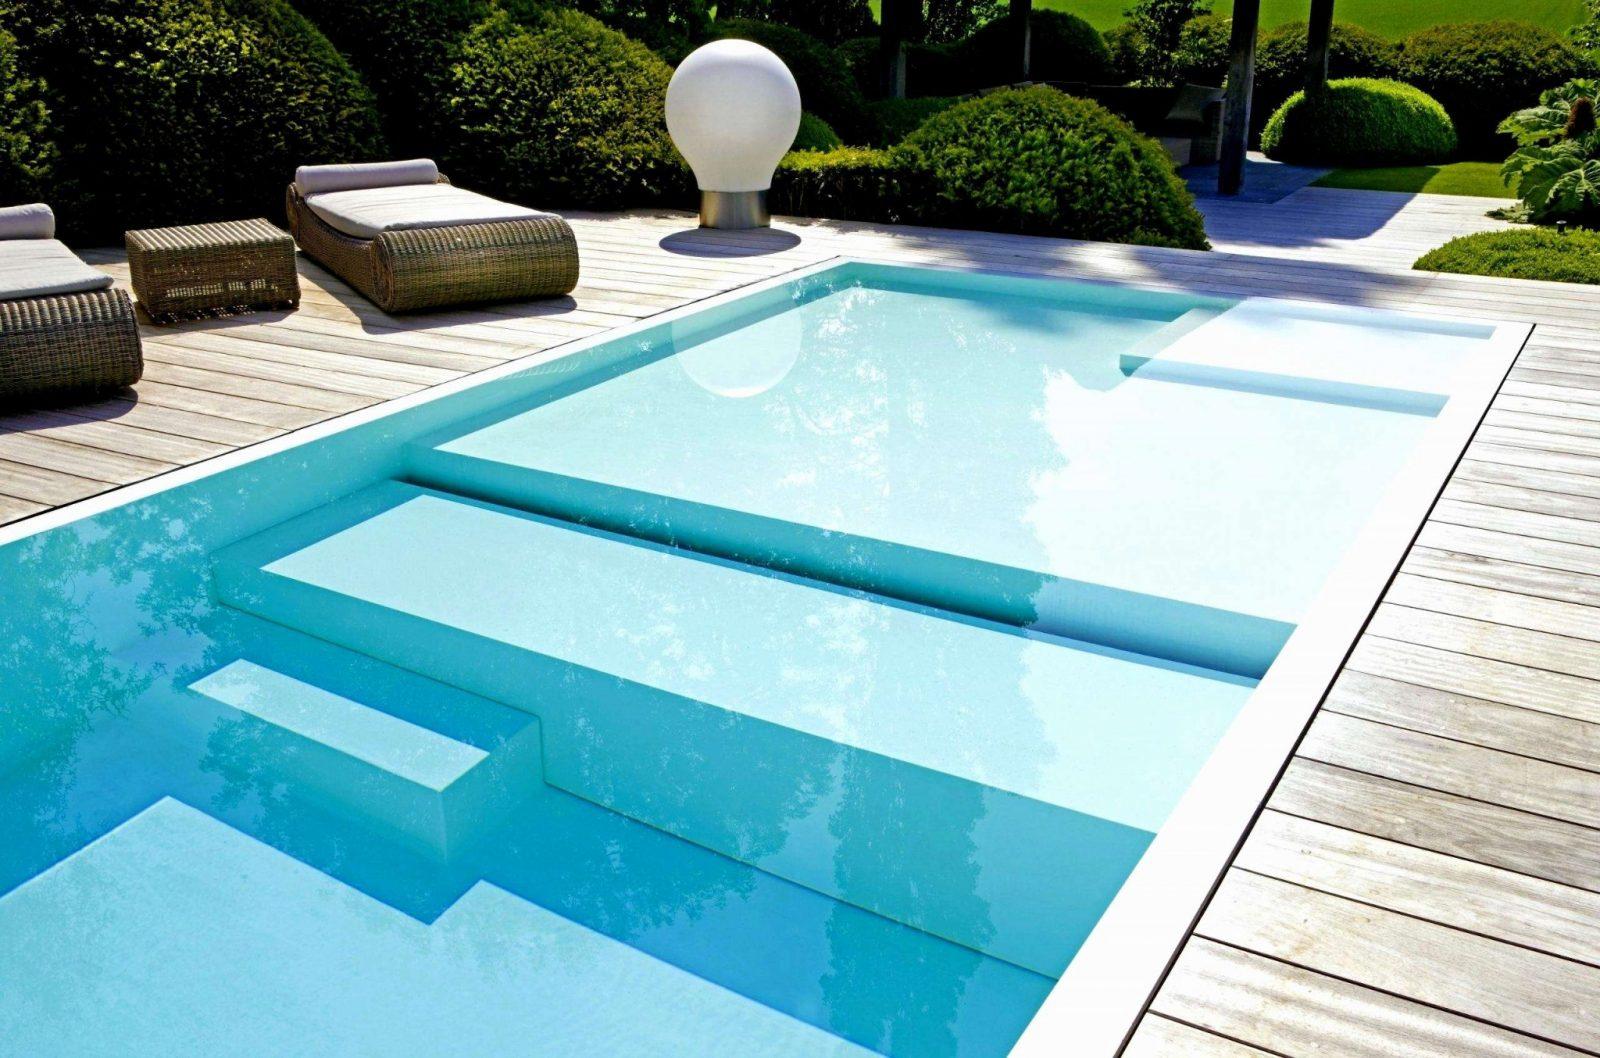 Pool Selber Bauen Paletten Elegant Pool Im Garten Selber Bauen von Pool Aus Paletten Selber Bauen Photo